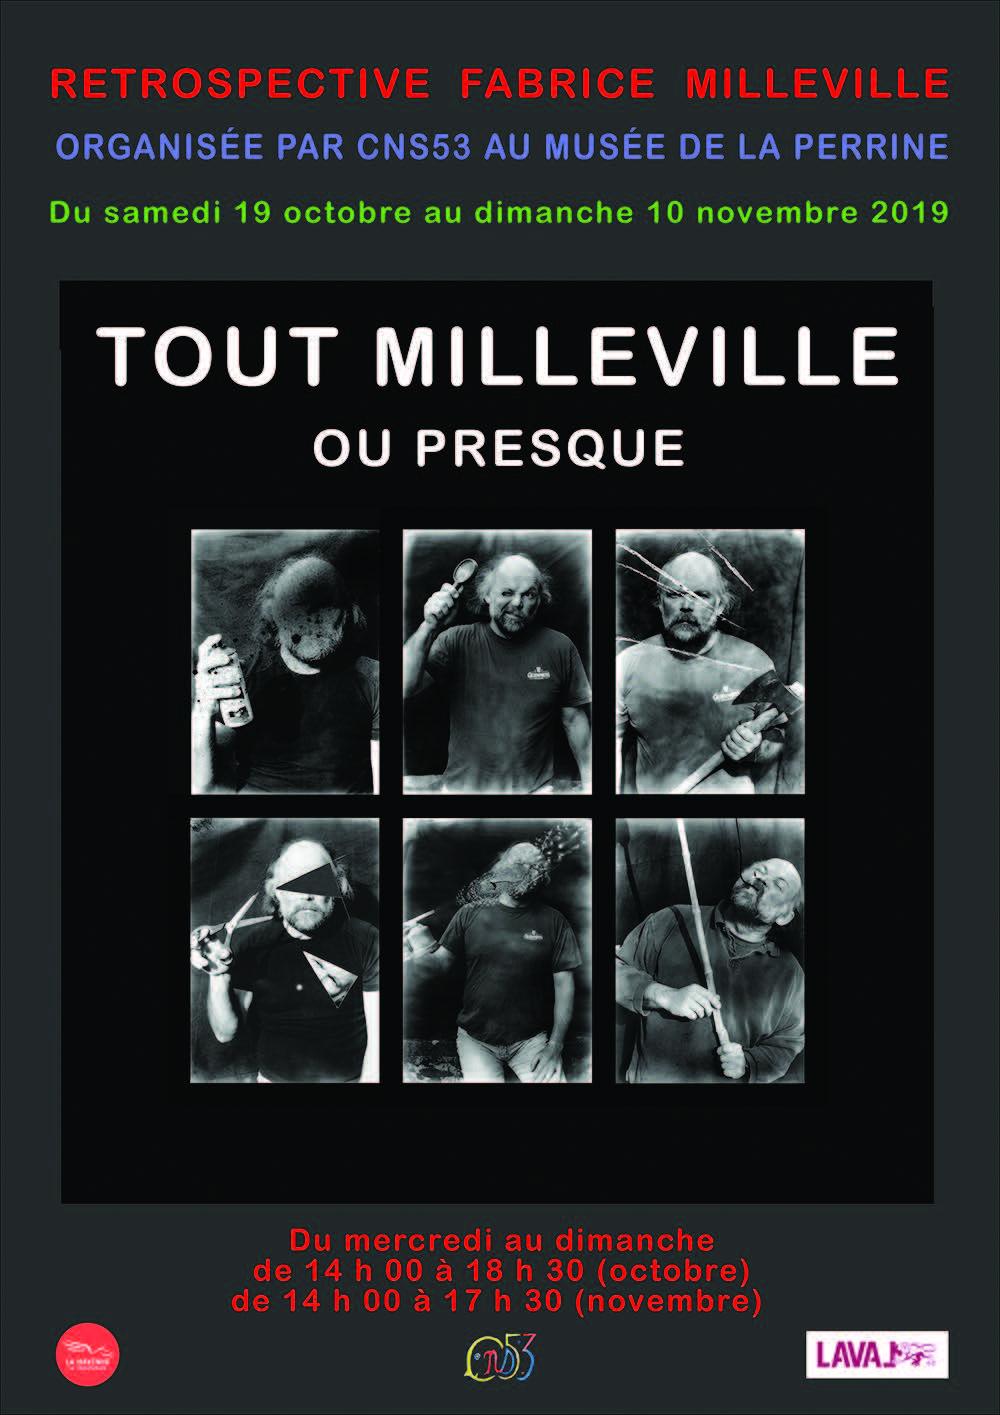 Exposition : Retrospective Fabrice Milleville